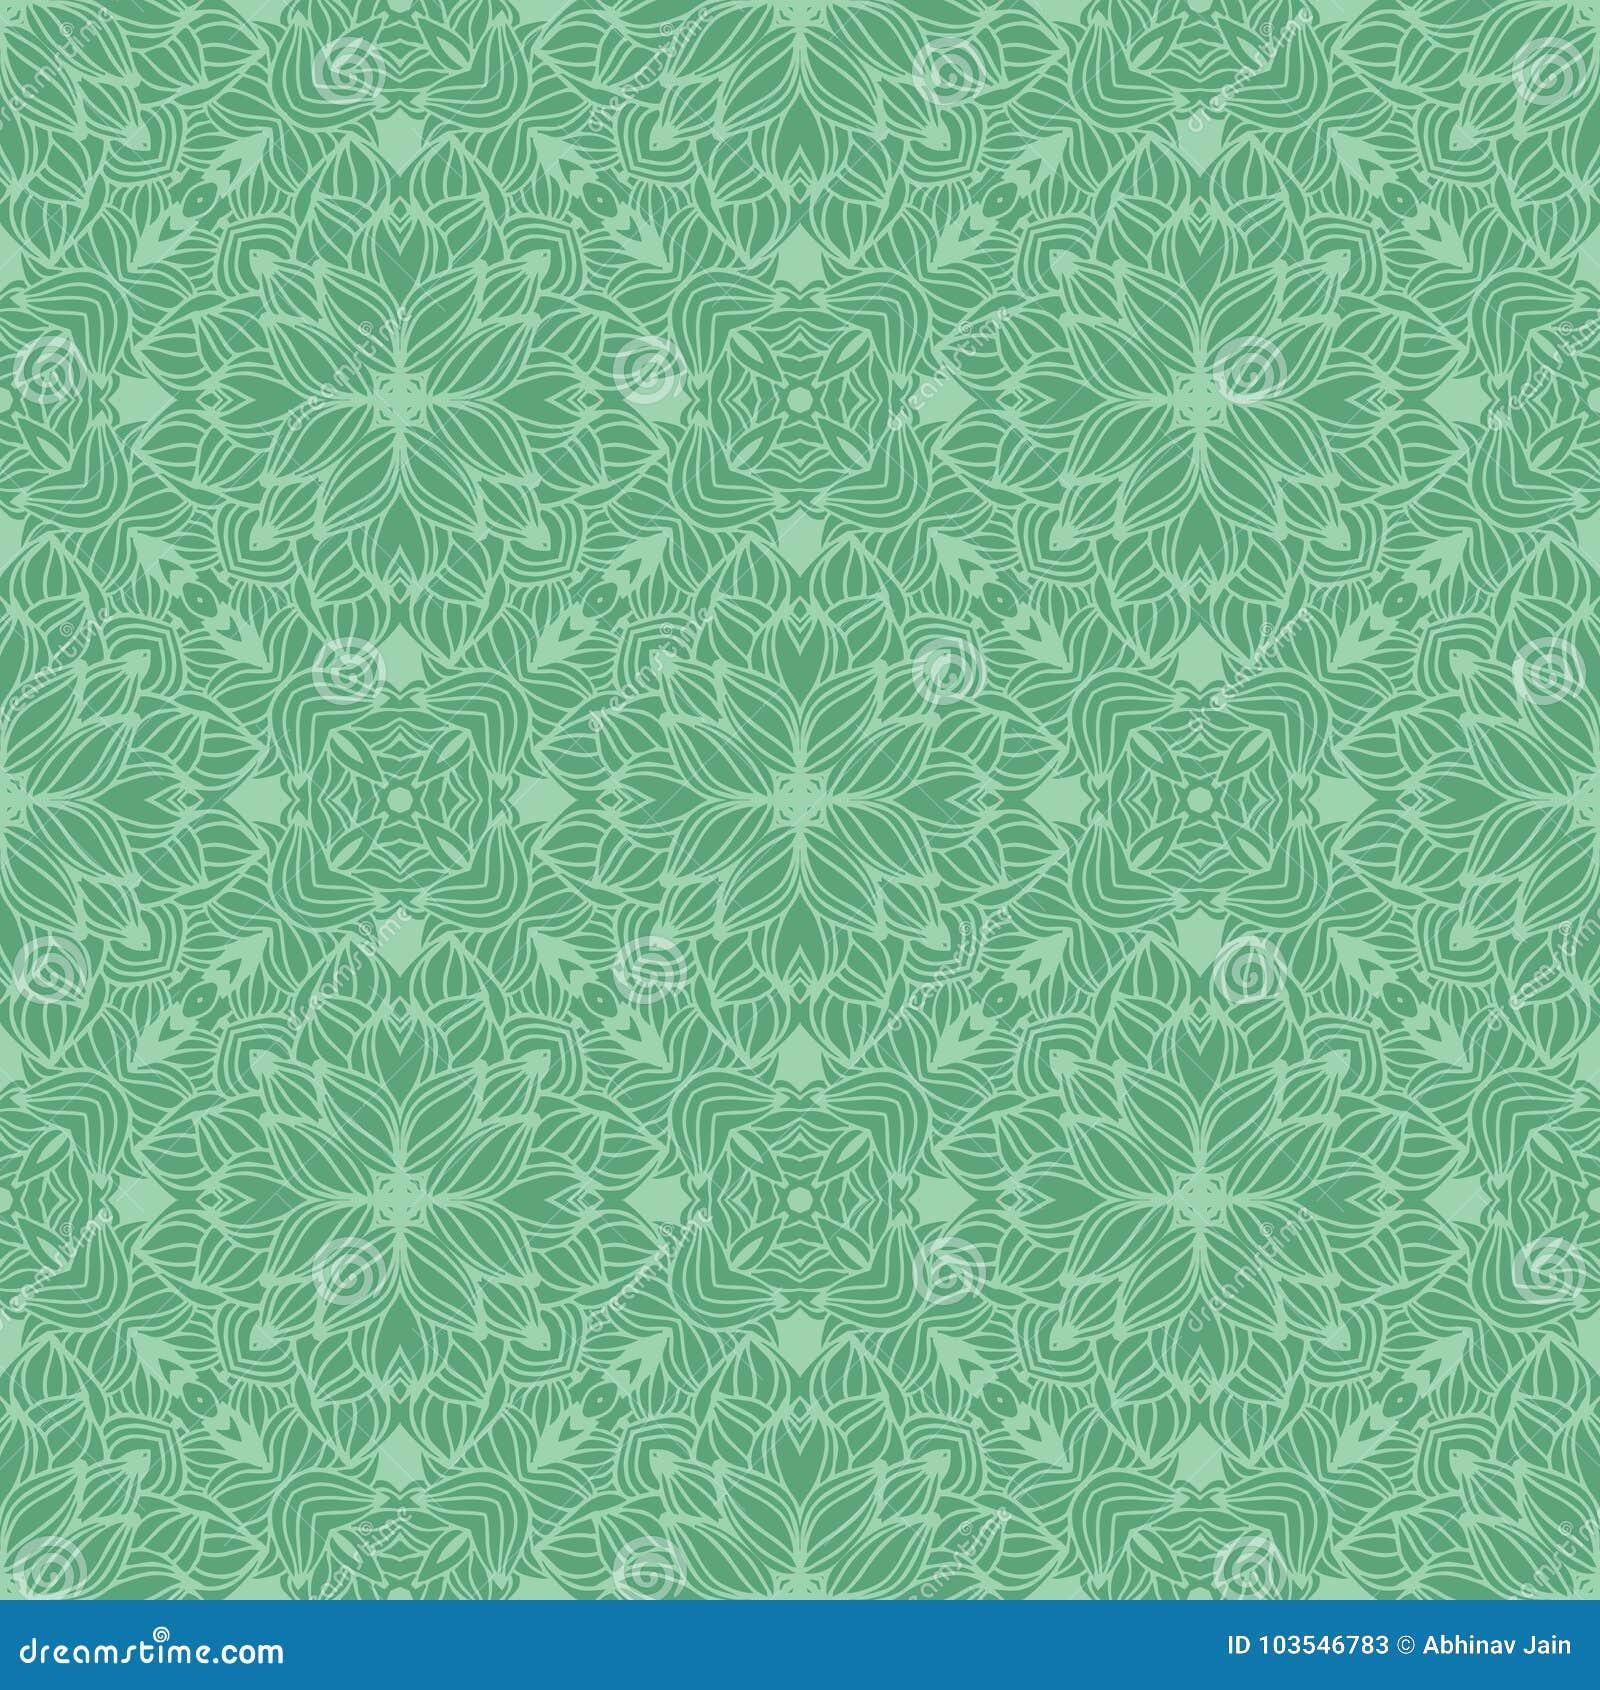 DENSE AQUA FLOWER PATTERN BACKGROUND IN GREEN TONE